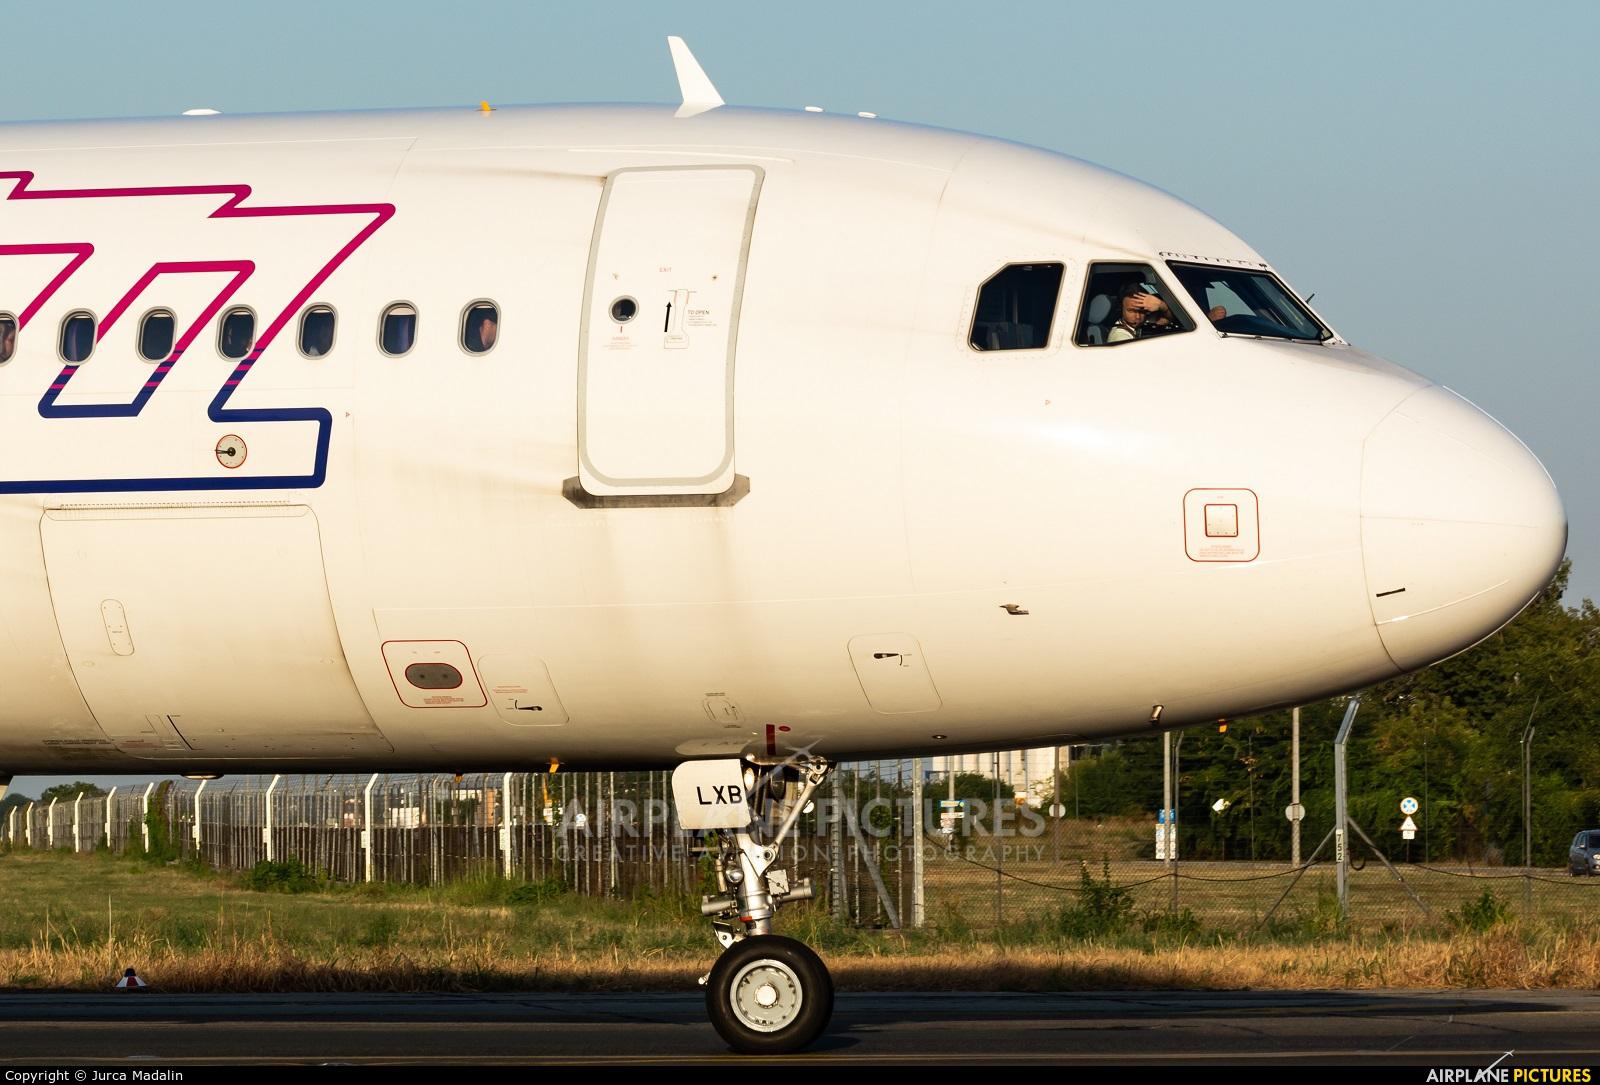 Wizz Air HA-LXB aircraft at Bucharest - Henri Coandă